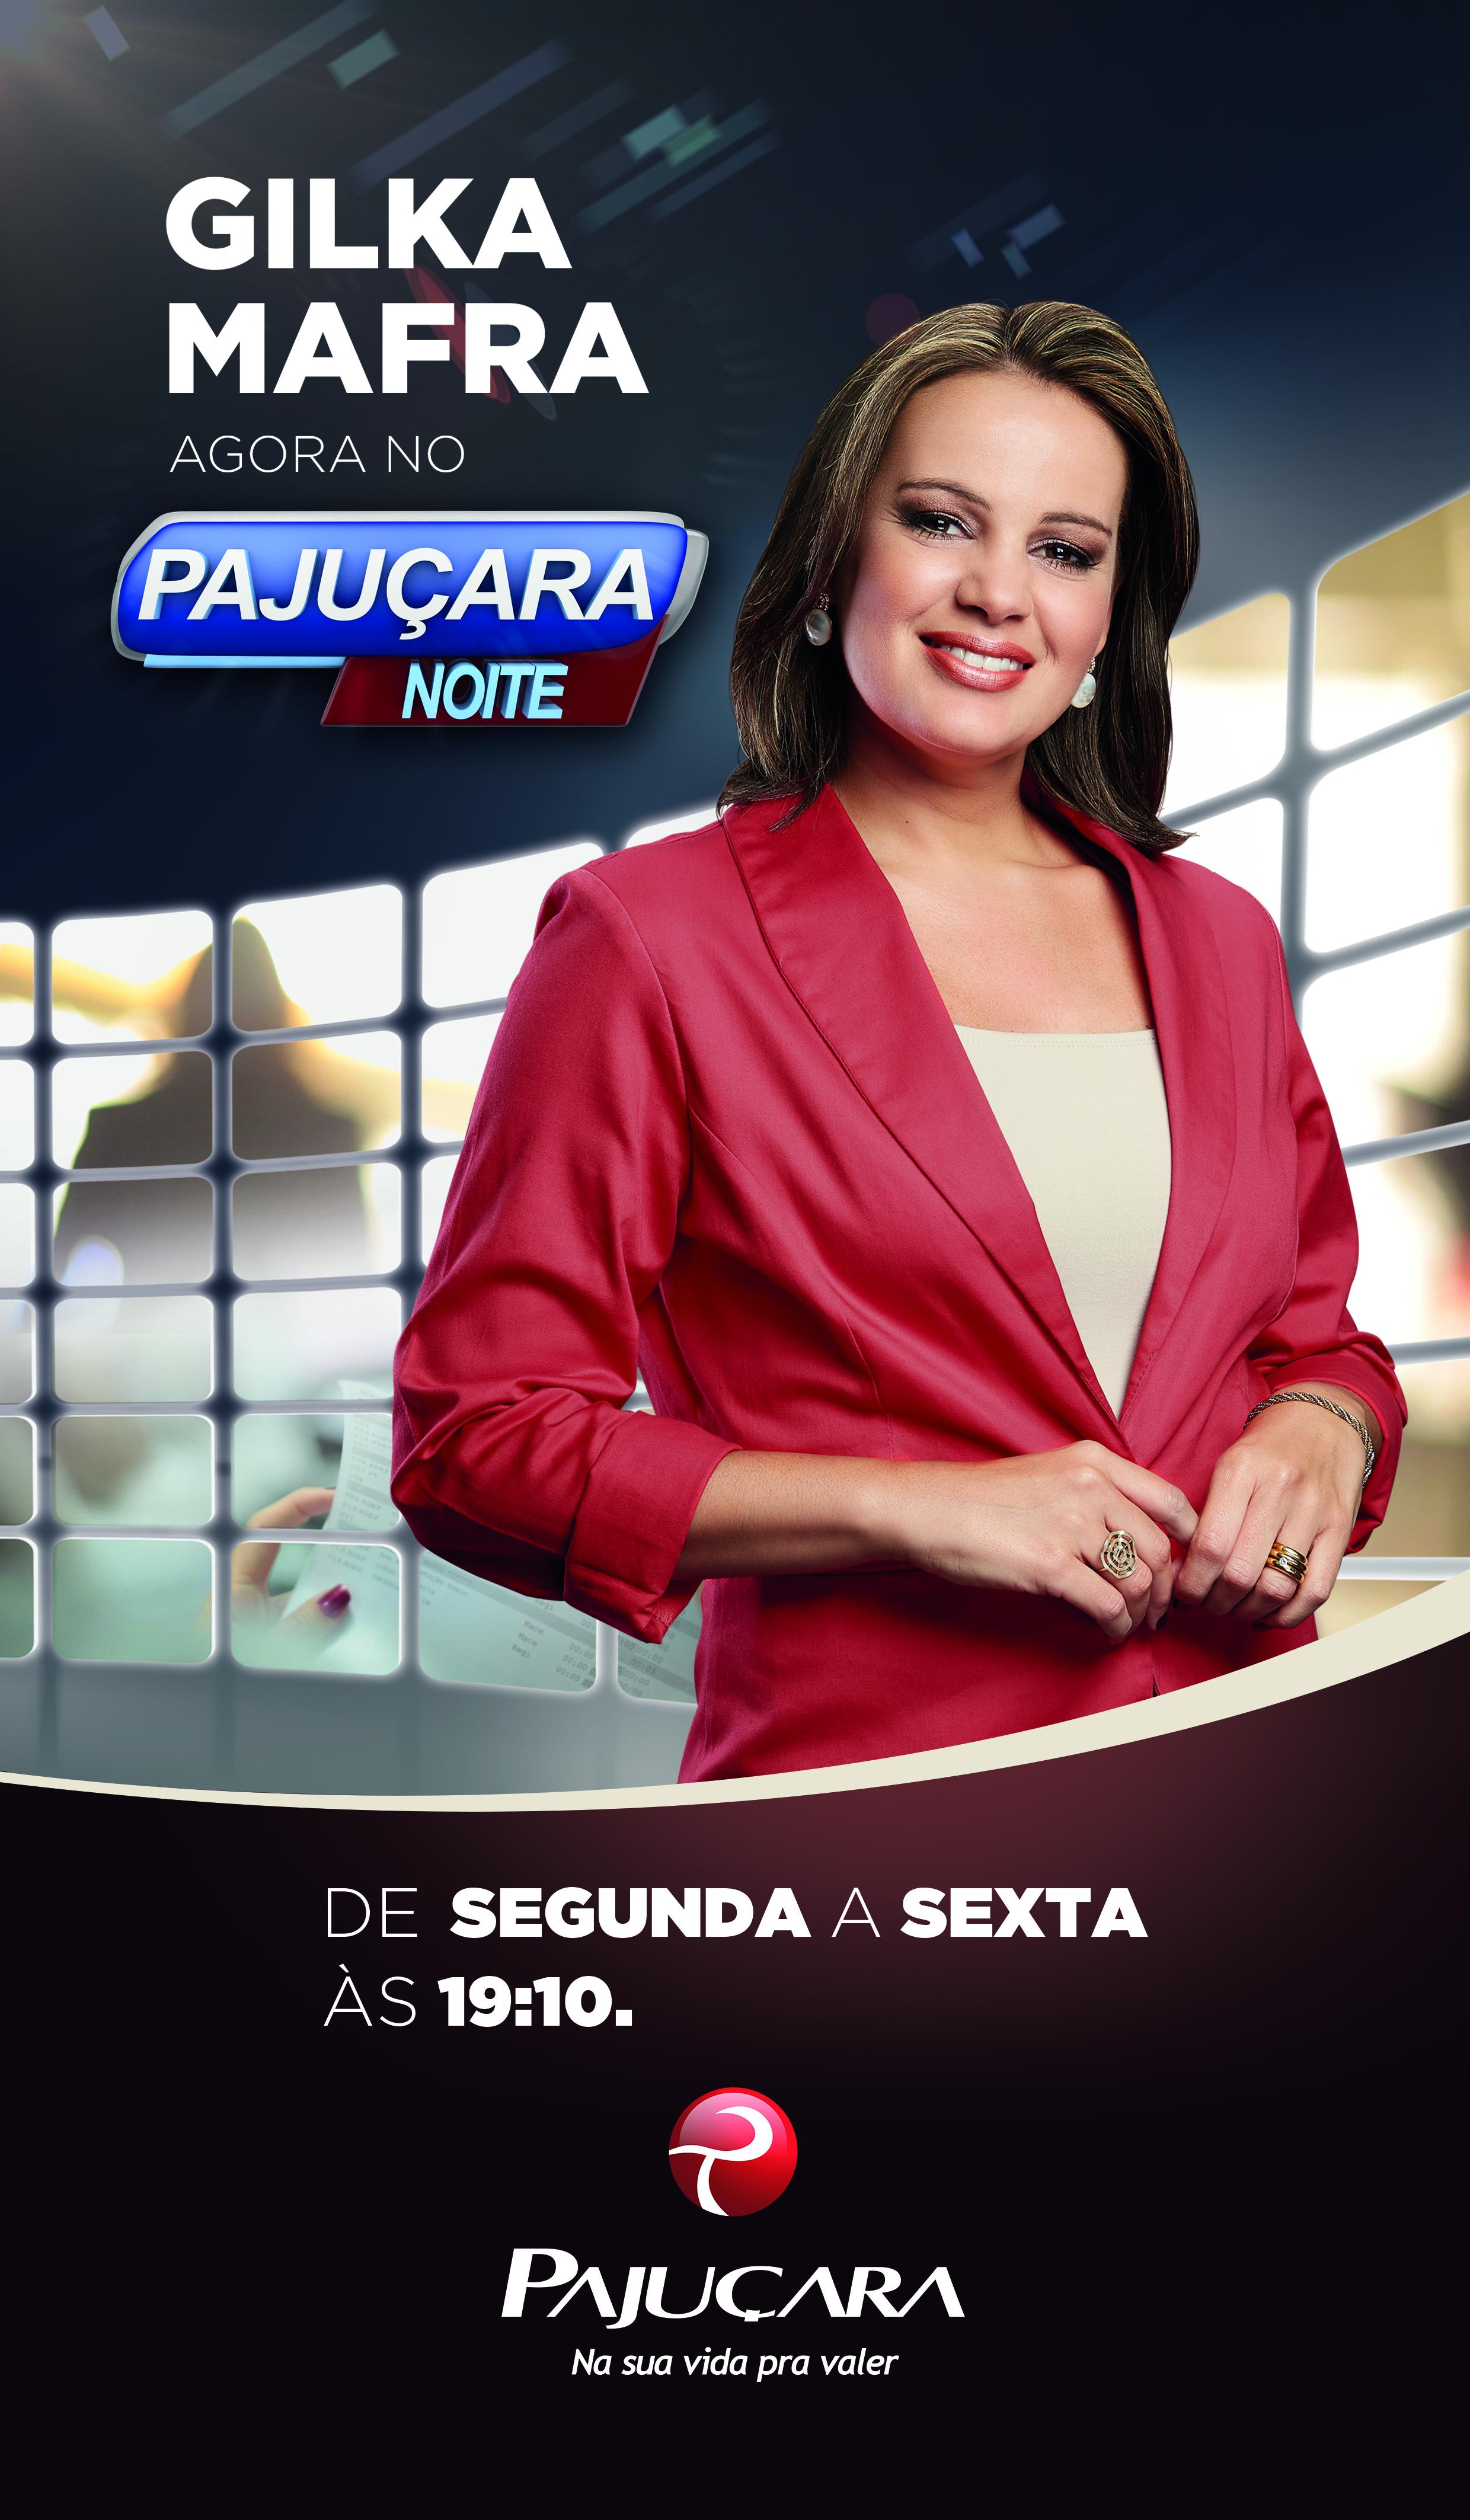 TV PAJUÇARA - GILKA MAFRA - PORTARIA - 130x230.jpg